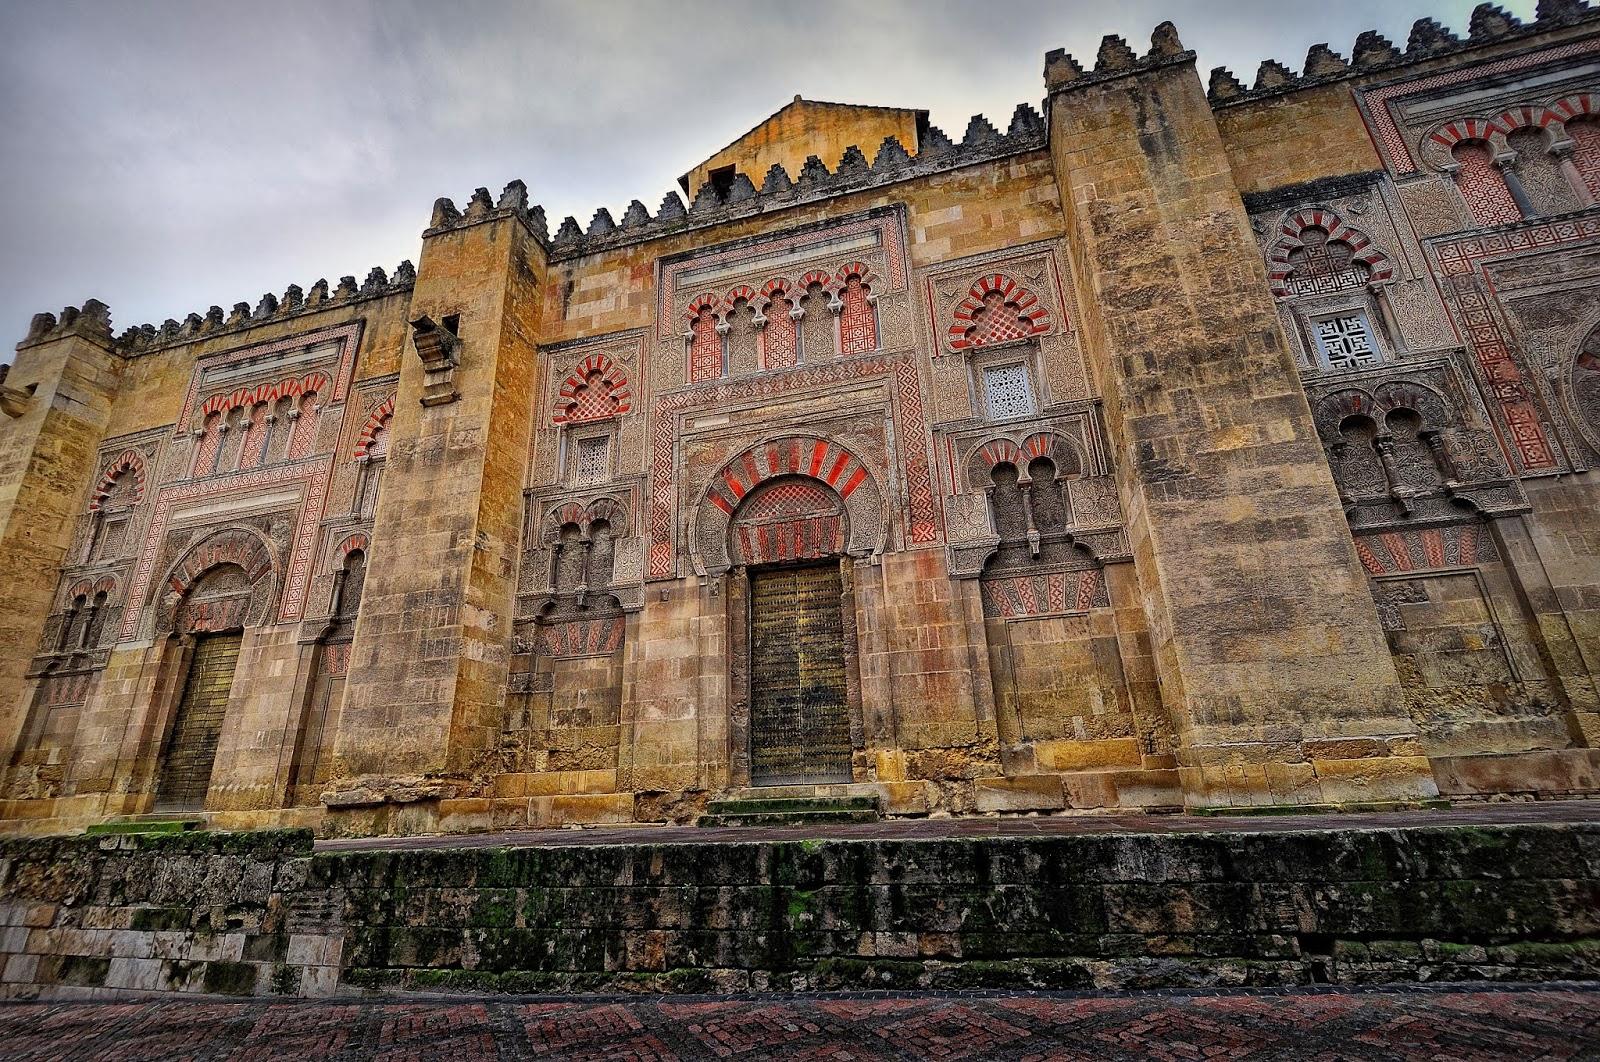 Mausoleum of Moulay Idris II